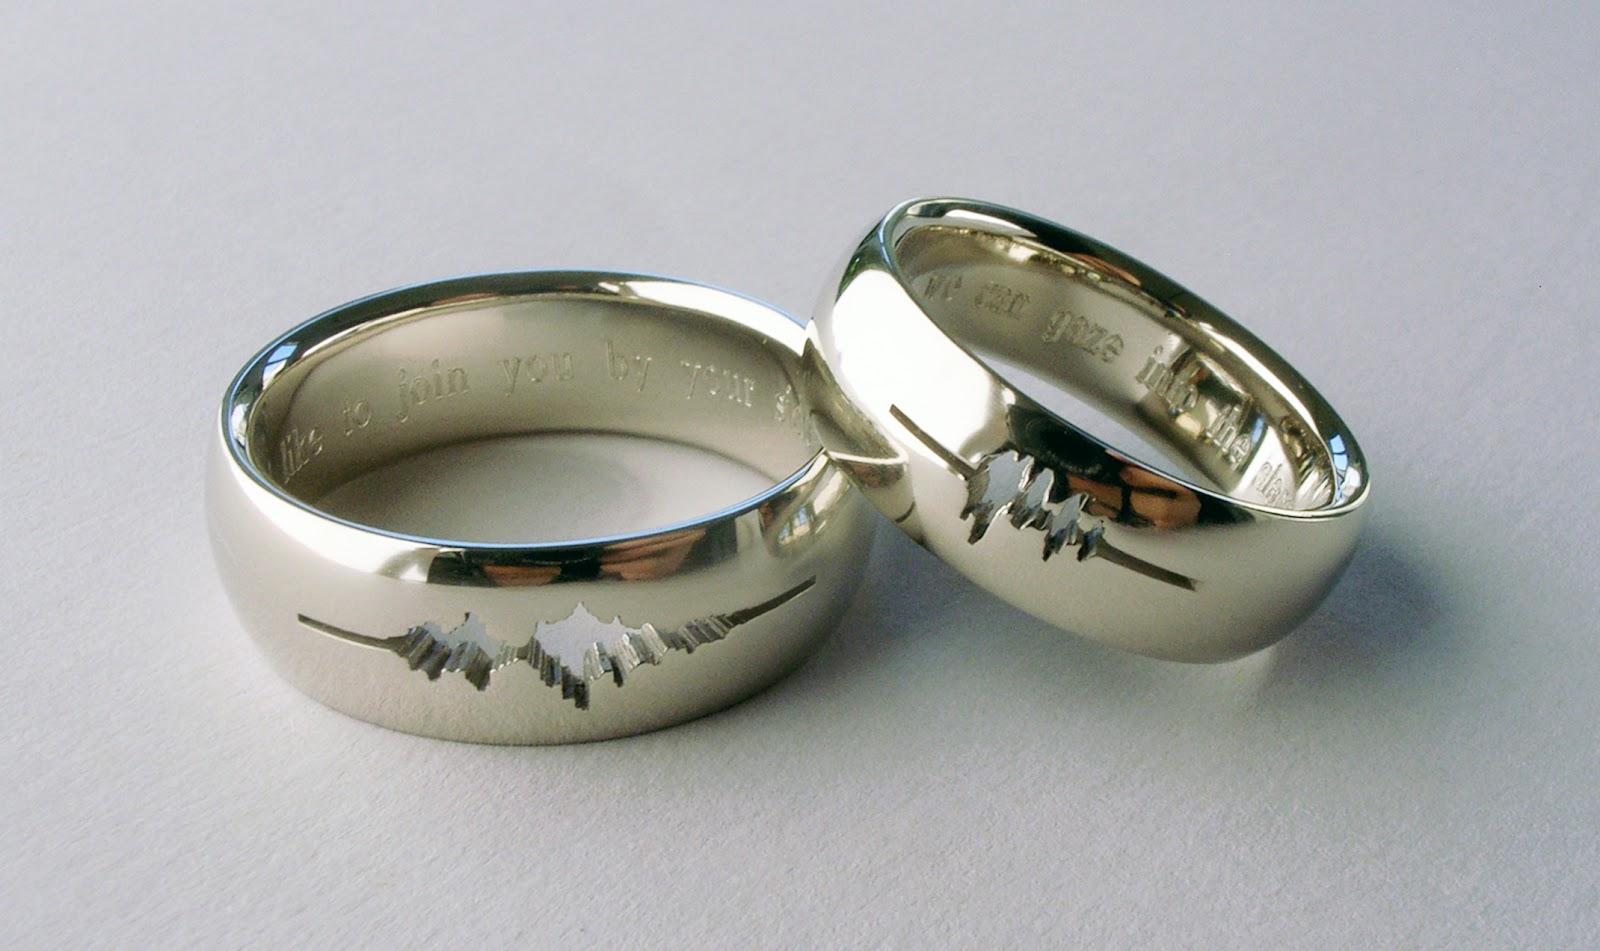 sakurako shimizu - Wedding Rings For Sale